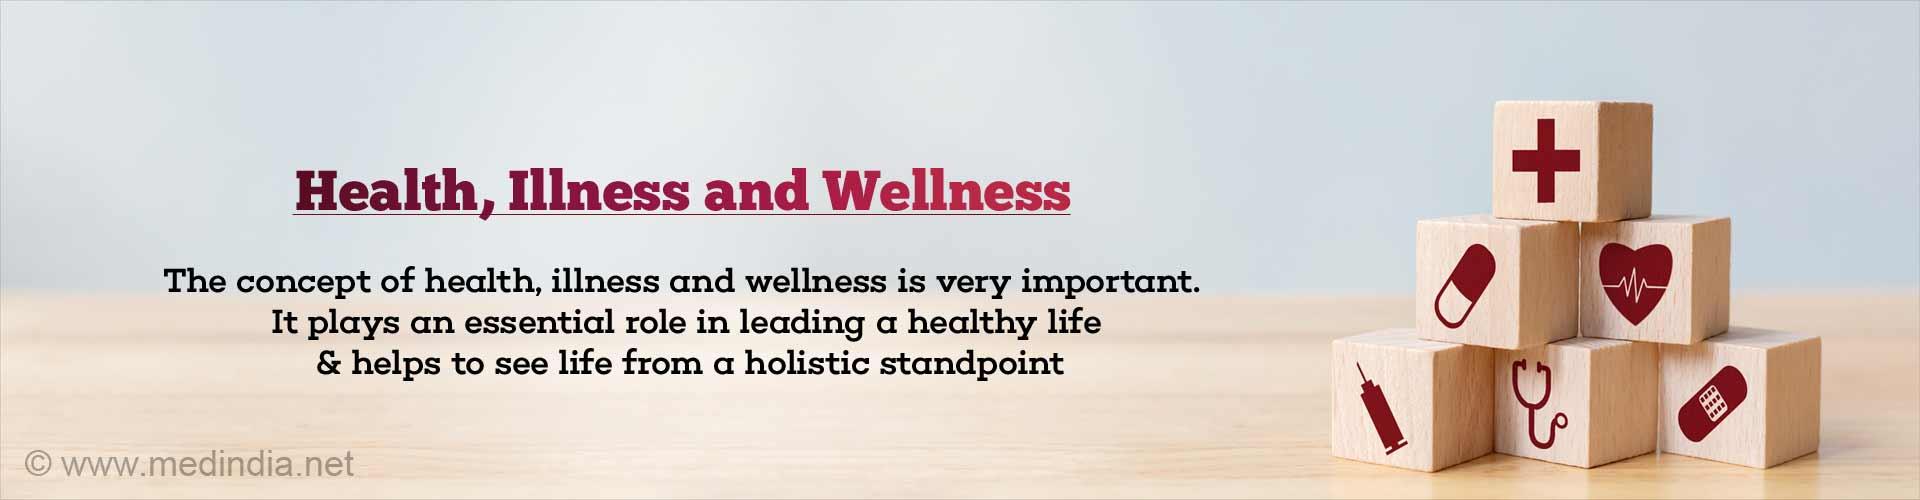 Health, Illness and Wellness: Essential Concept for a Holistic View of Life